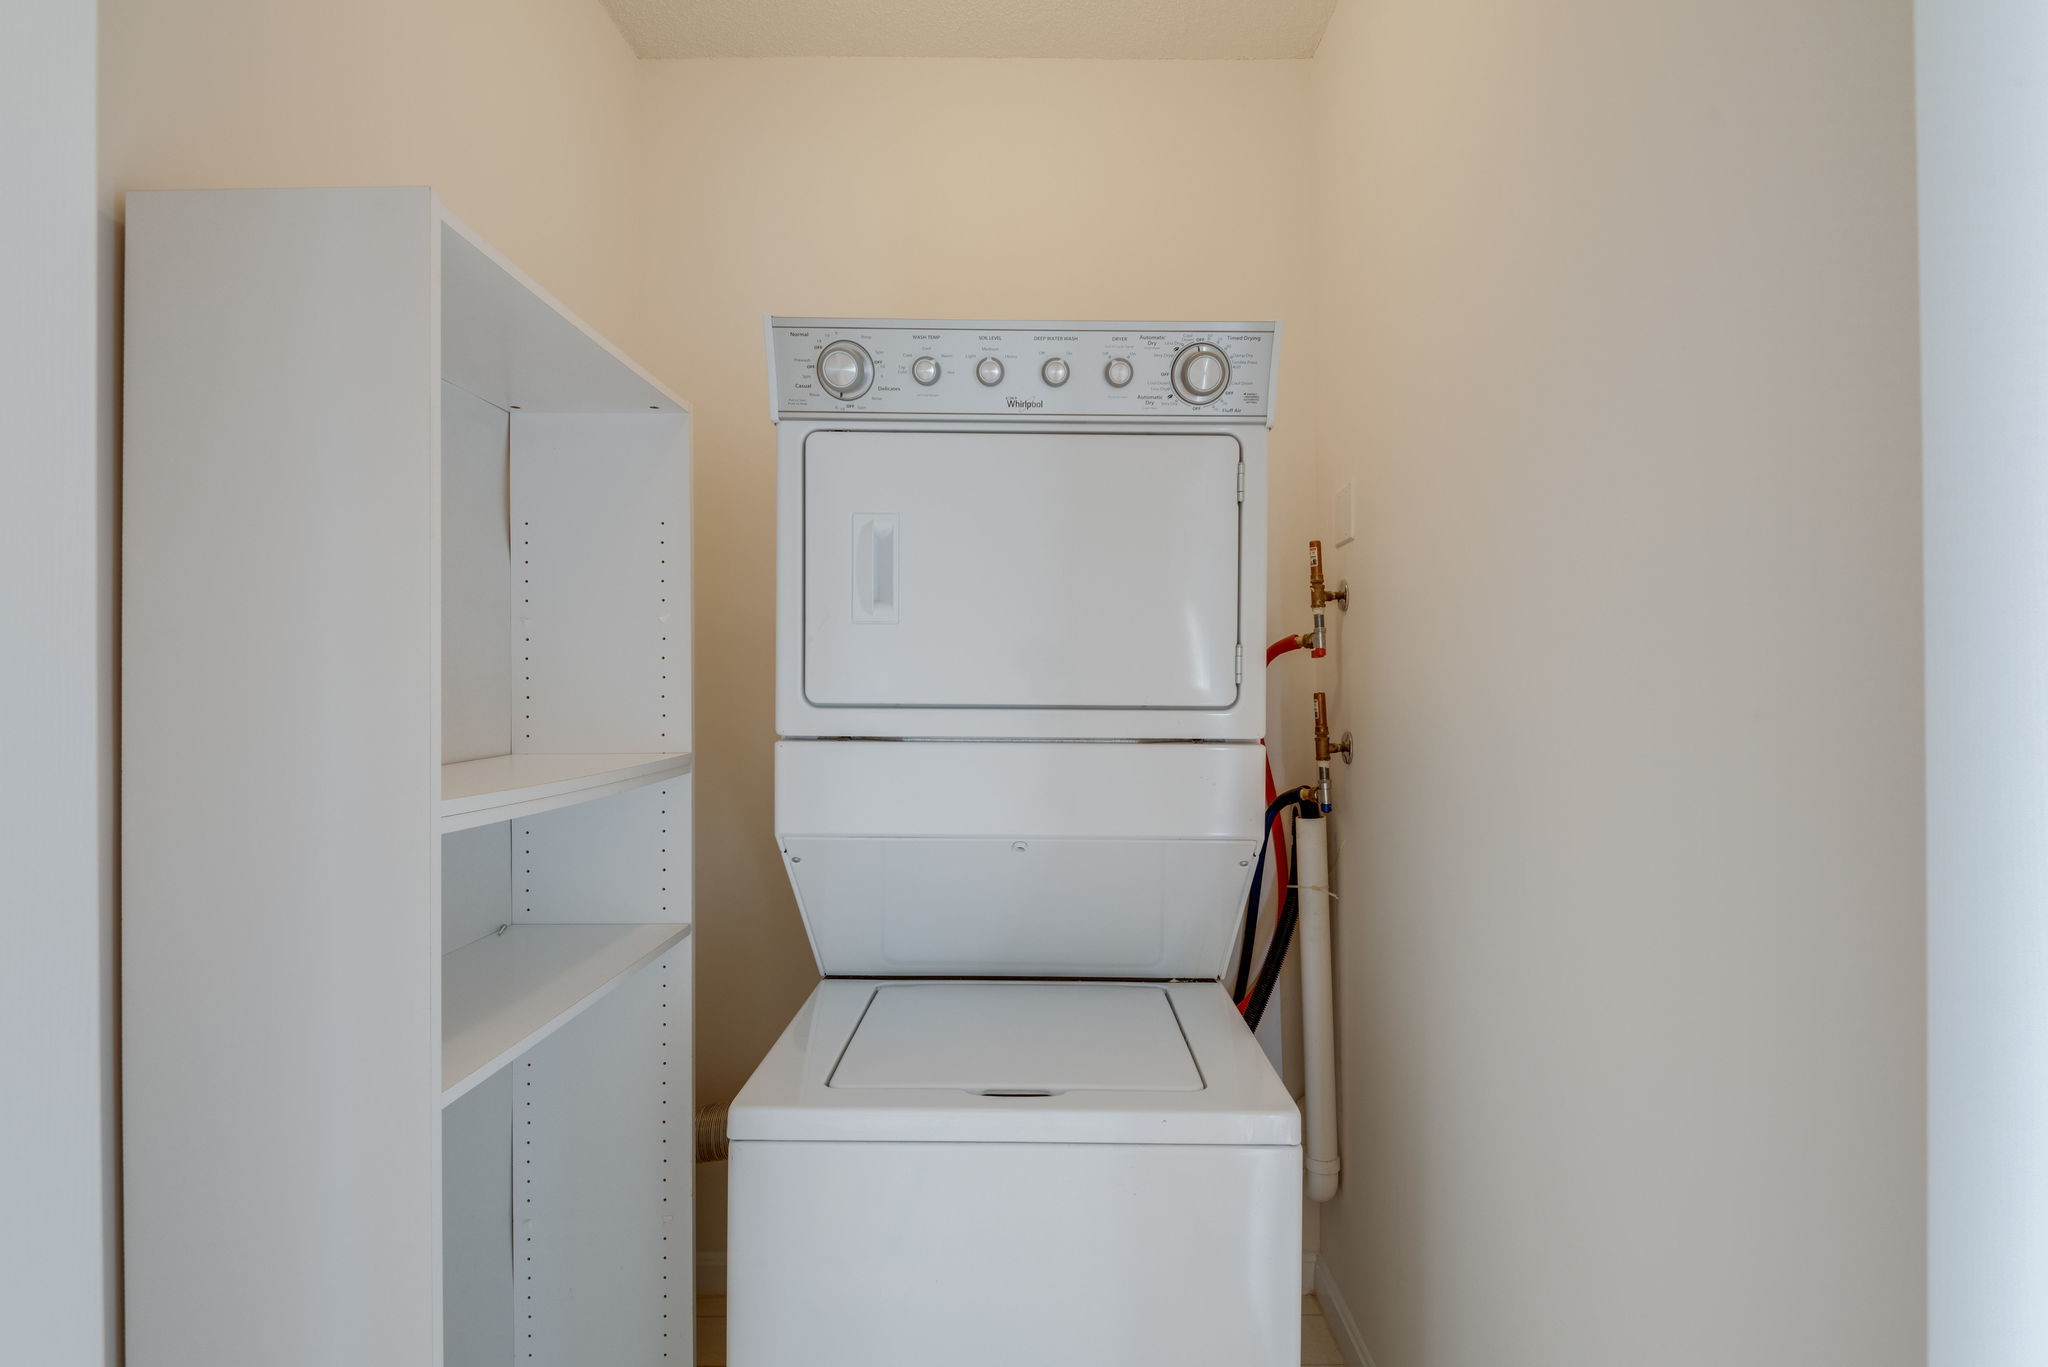 19365 Cypress Ridge Ter #1007, Leesburg- Laundry